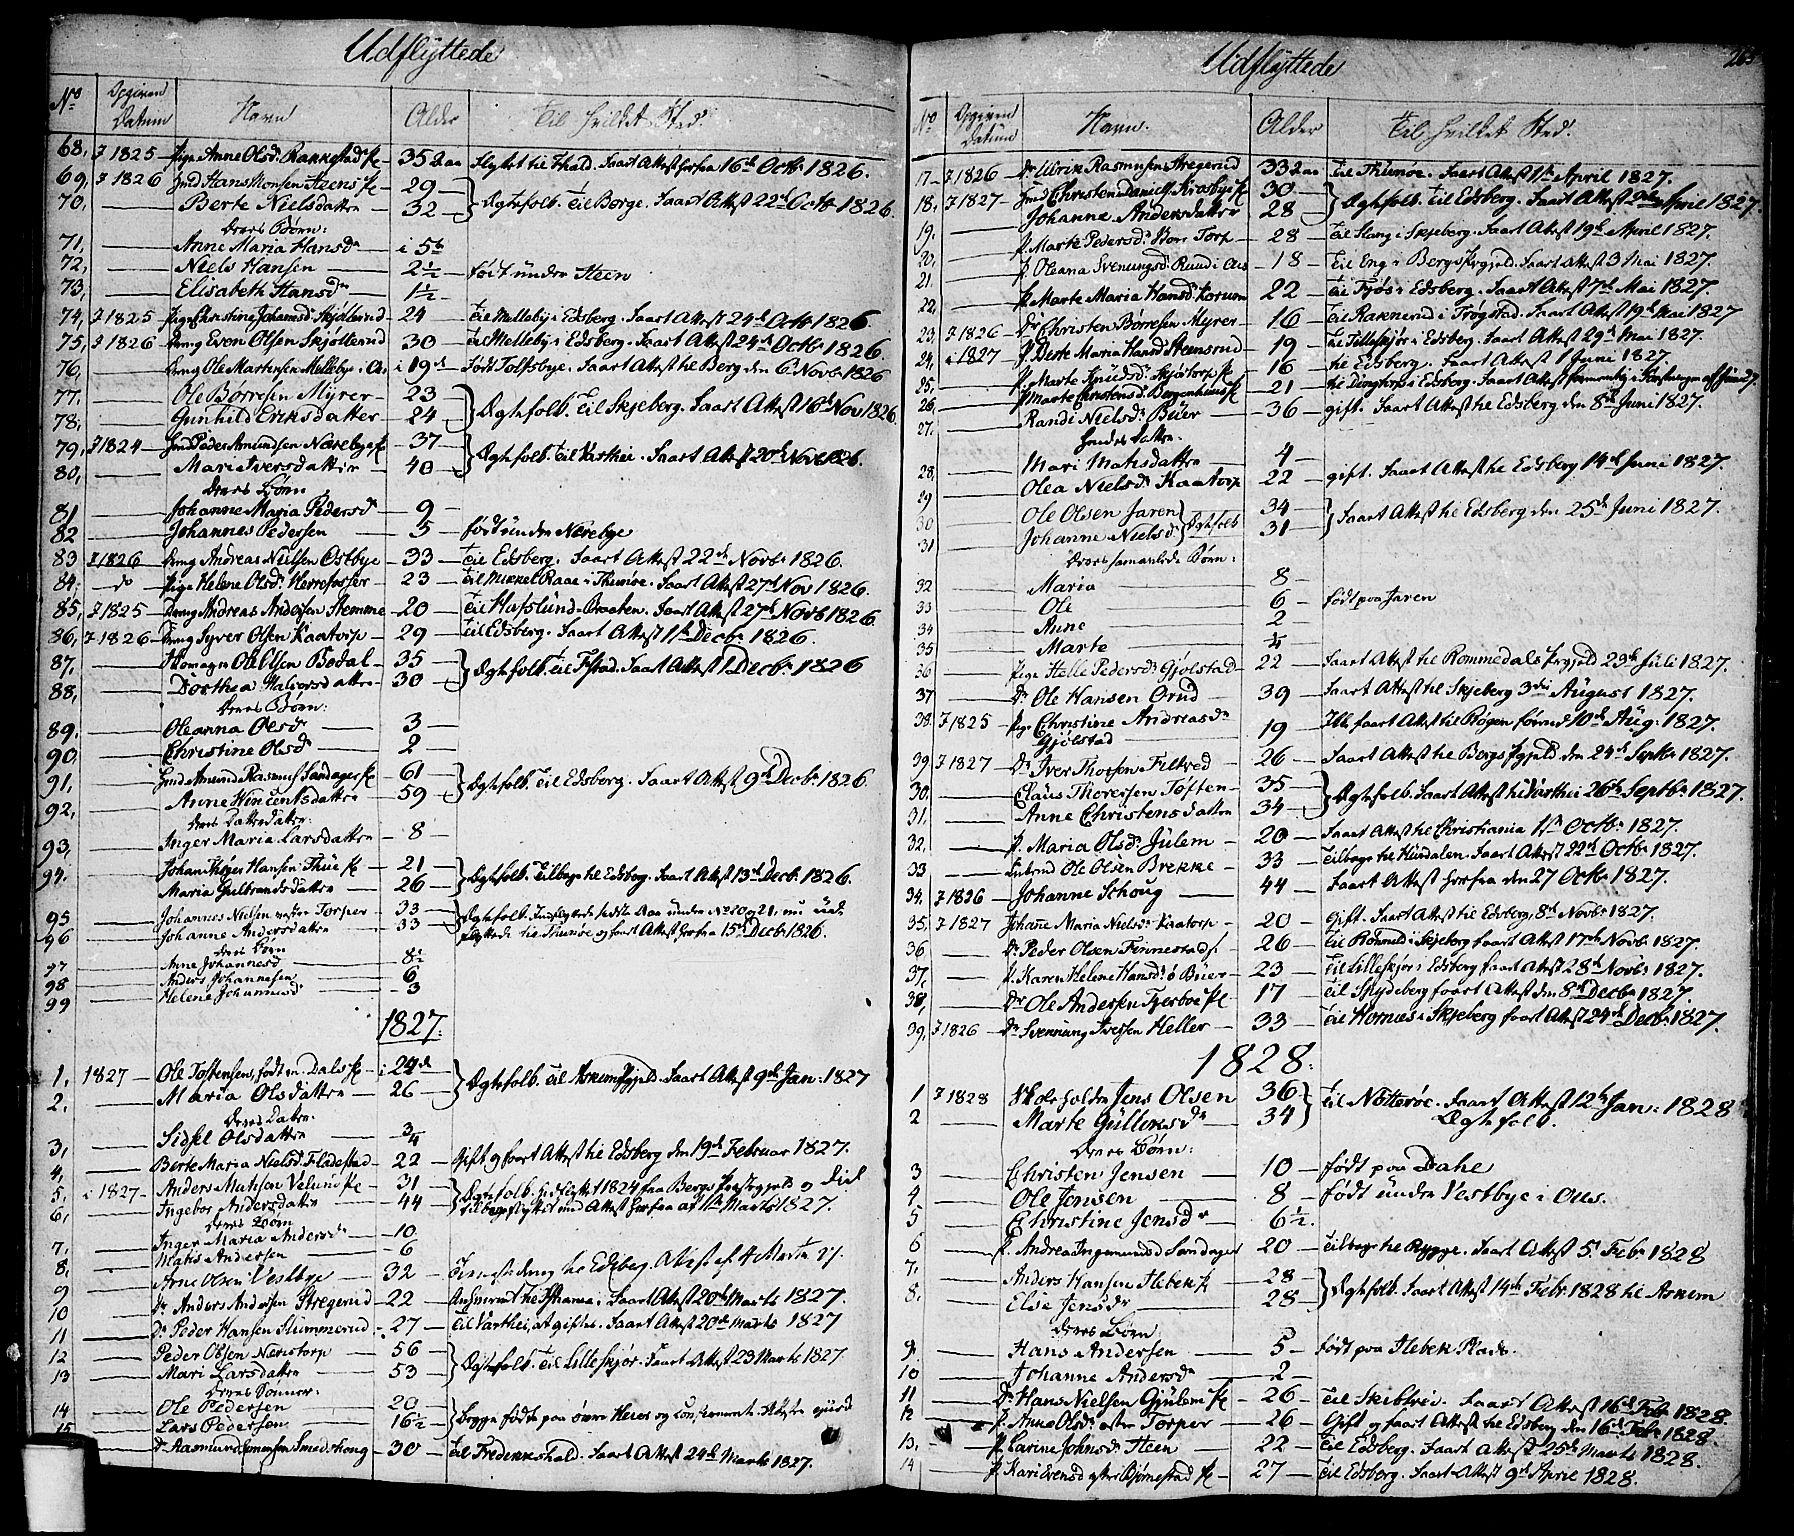 SAO, Rakkestad prestekontor Kirkebøker, F/Fa/L0007: Ministerialbok nr. I 7, 1825-1841, s. 265